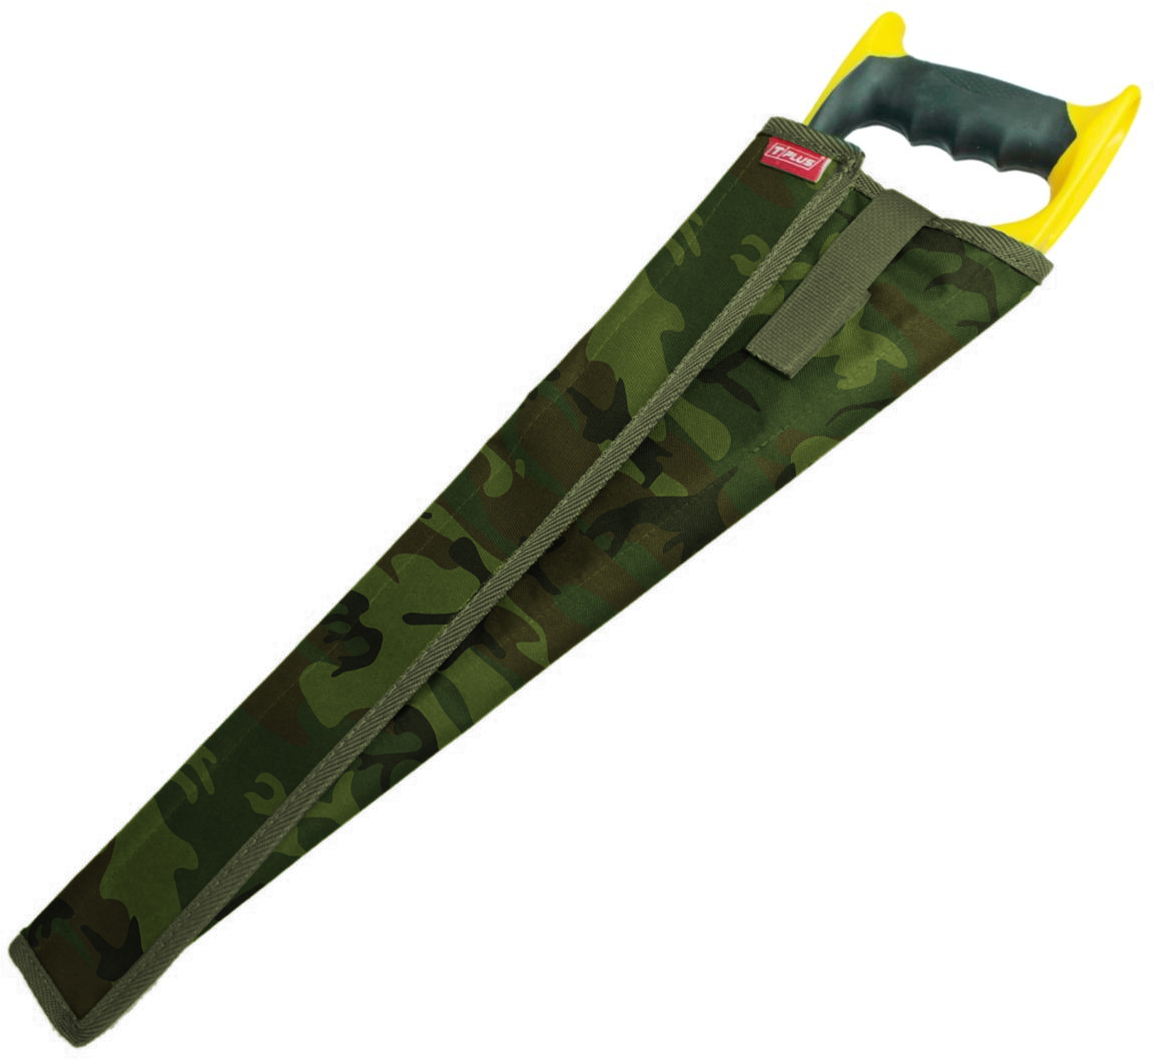 Чехол для ножовки Tplus, оксфорд 600, цвет: нато, 35 см